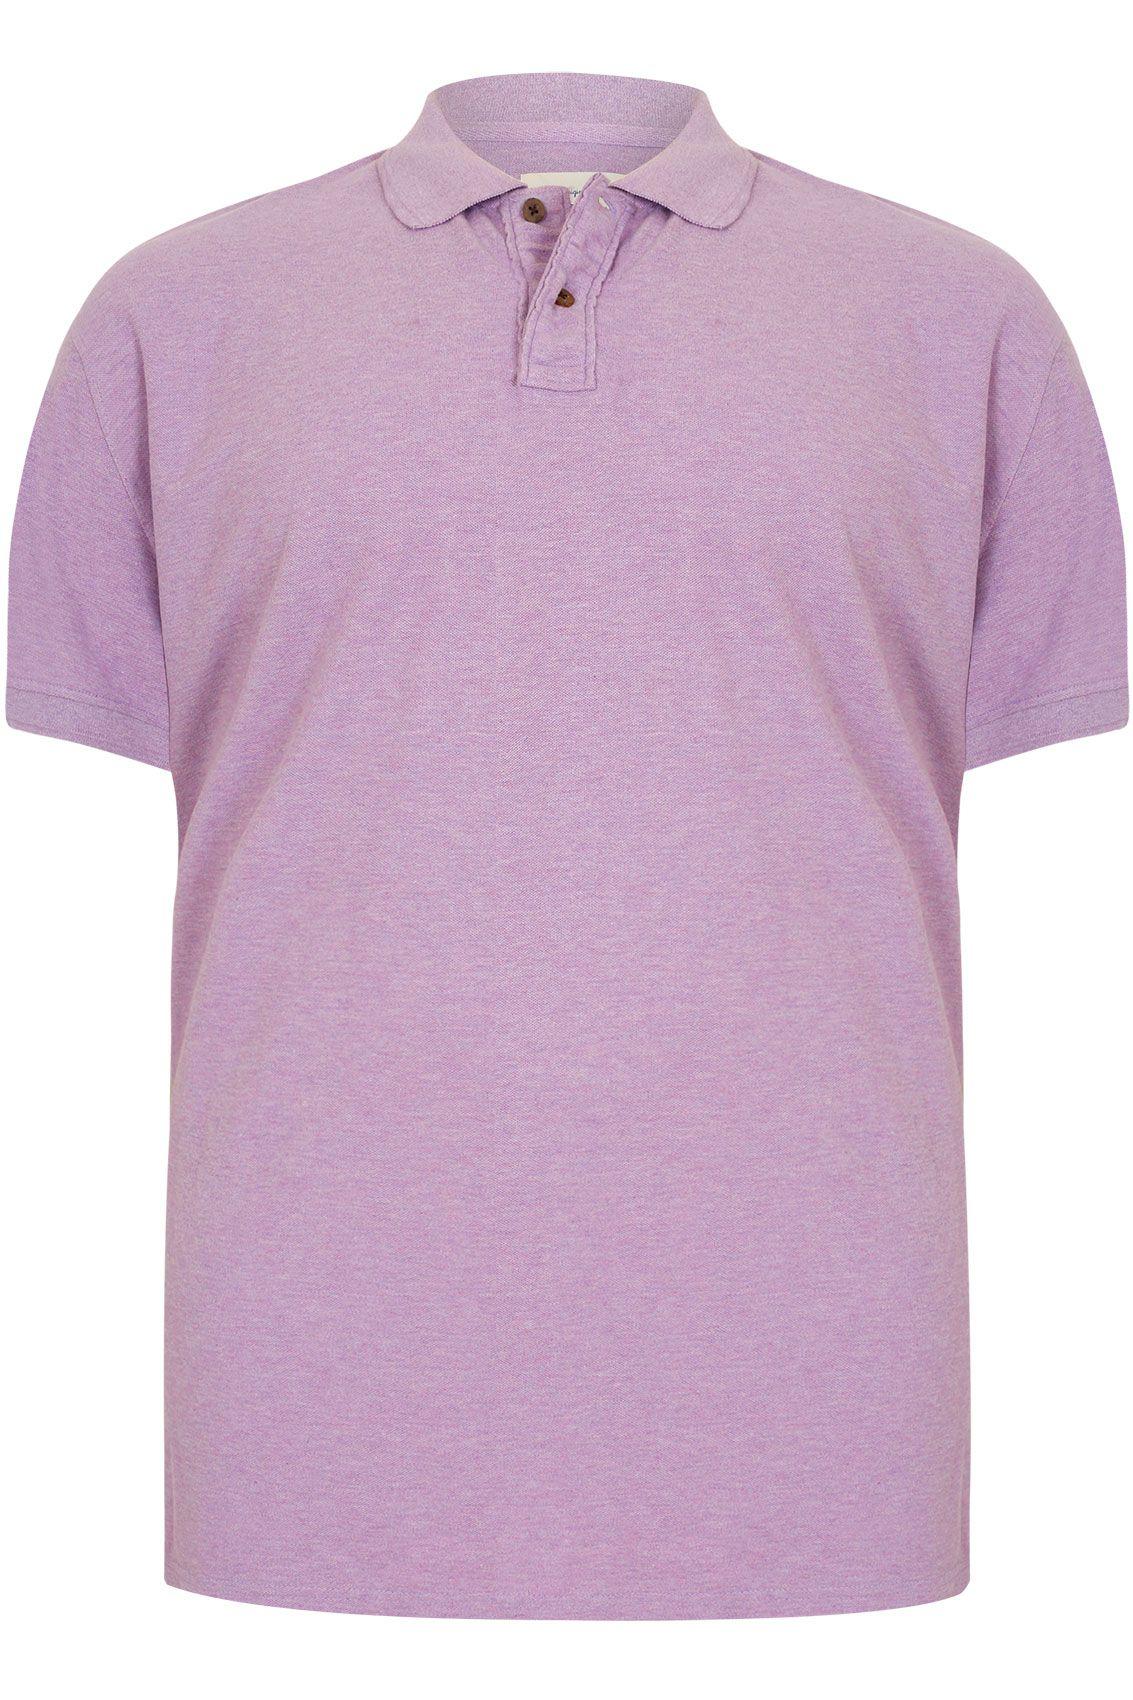 Where To Buy Cheap Plain Polo Shirts Rldm